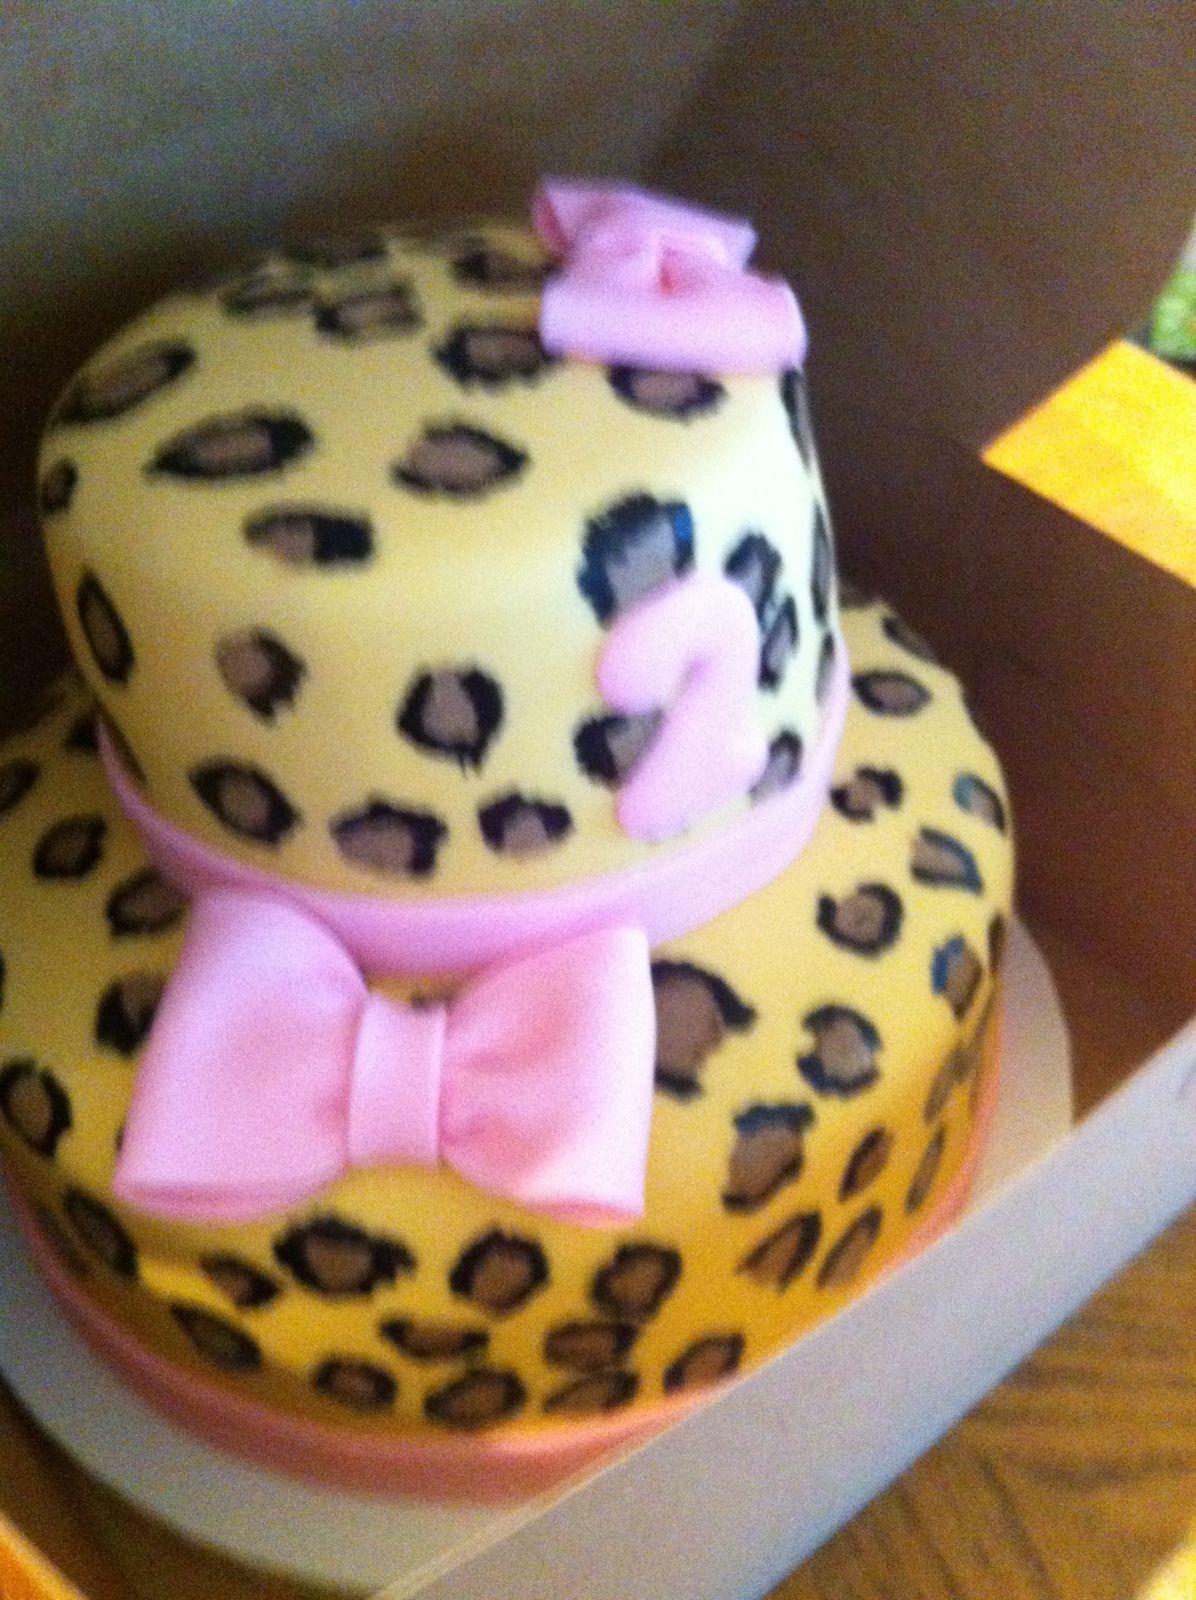 Awe Dog Cake 4th Birthday Baby Boy Mr Wilson